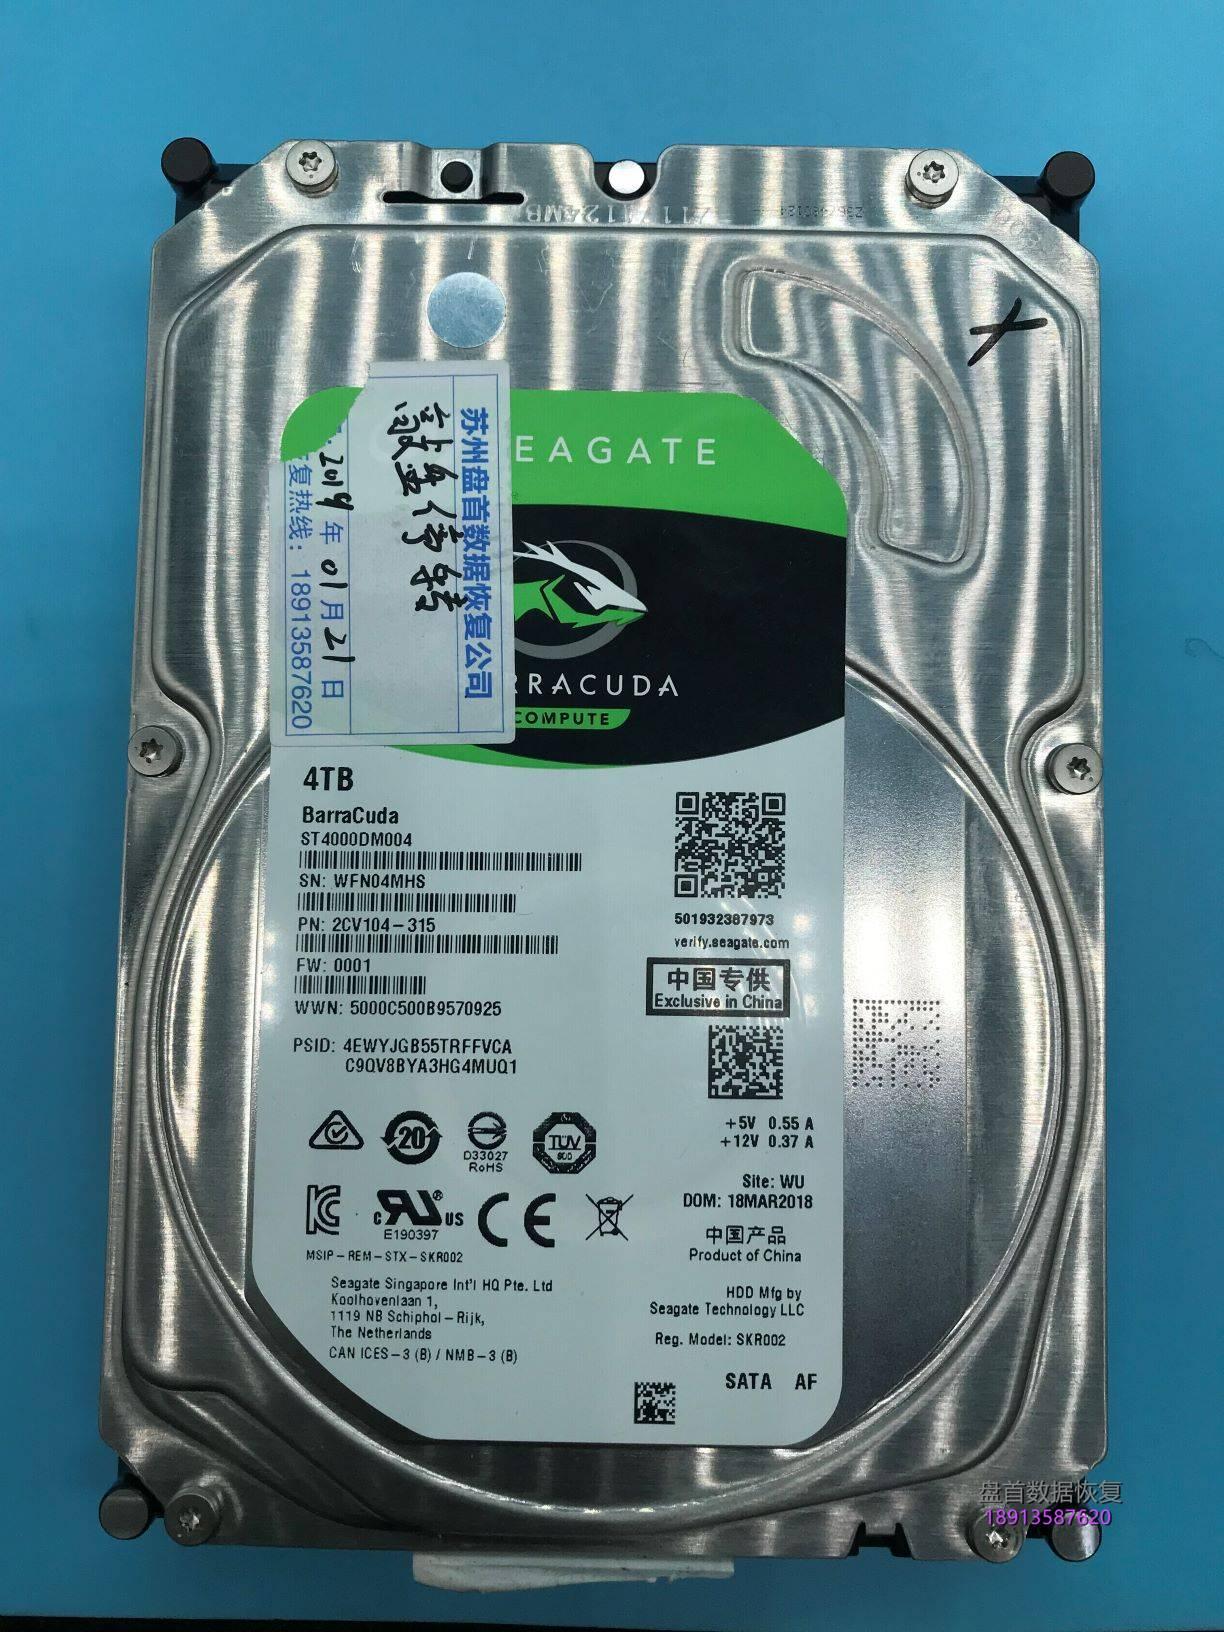 0-25 ST4000DM004通电异响敲盘几秒停转希捷台式机硬盘开盘数据恢复完美成功